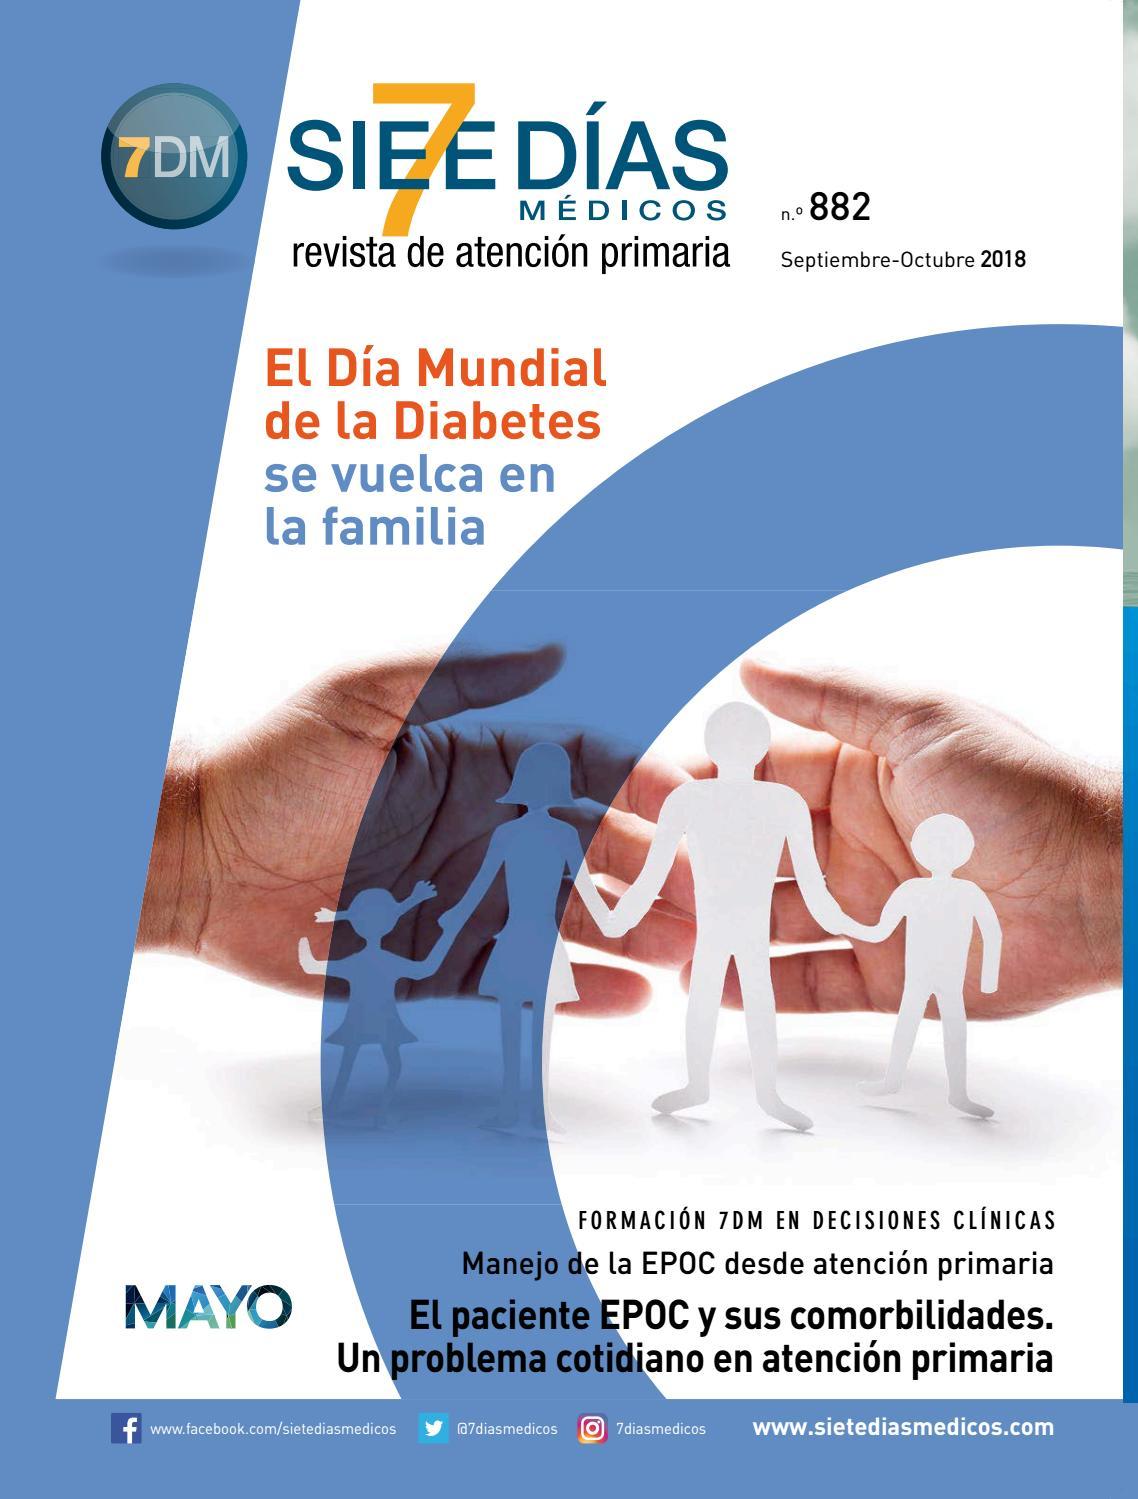 condiciones comórbidas asociadas con diabetes